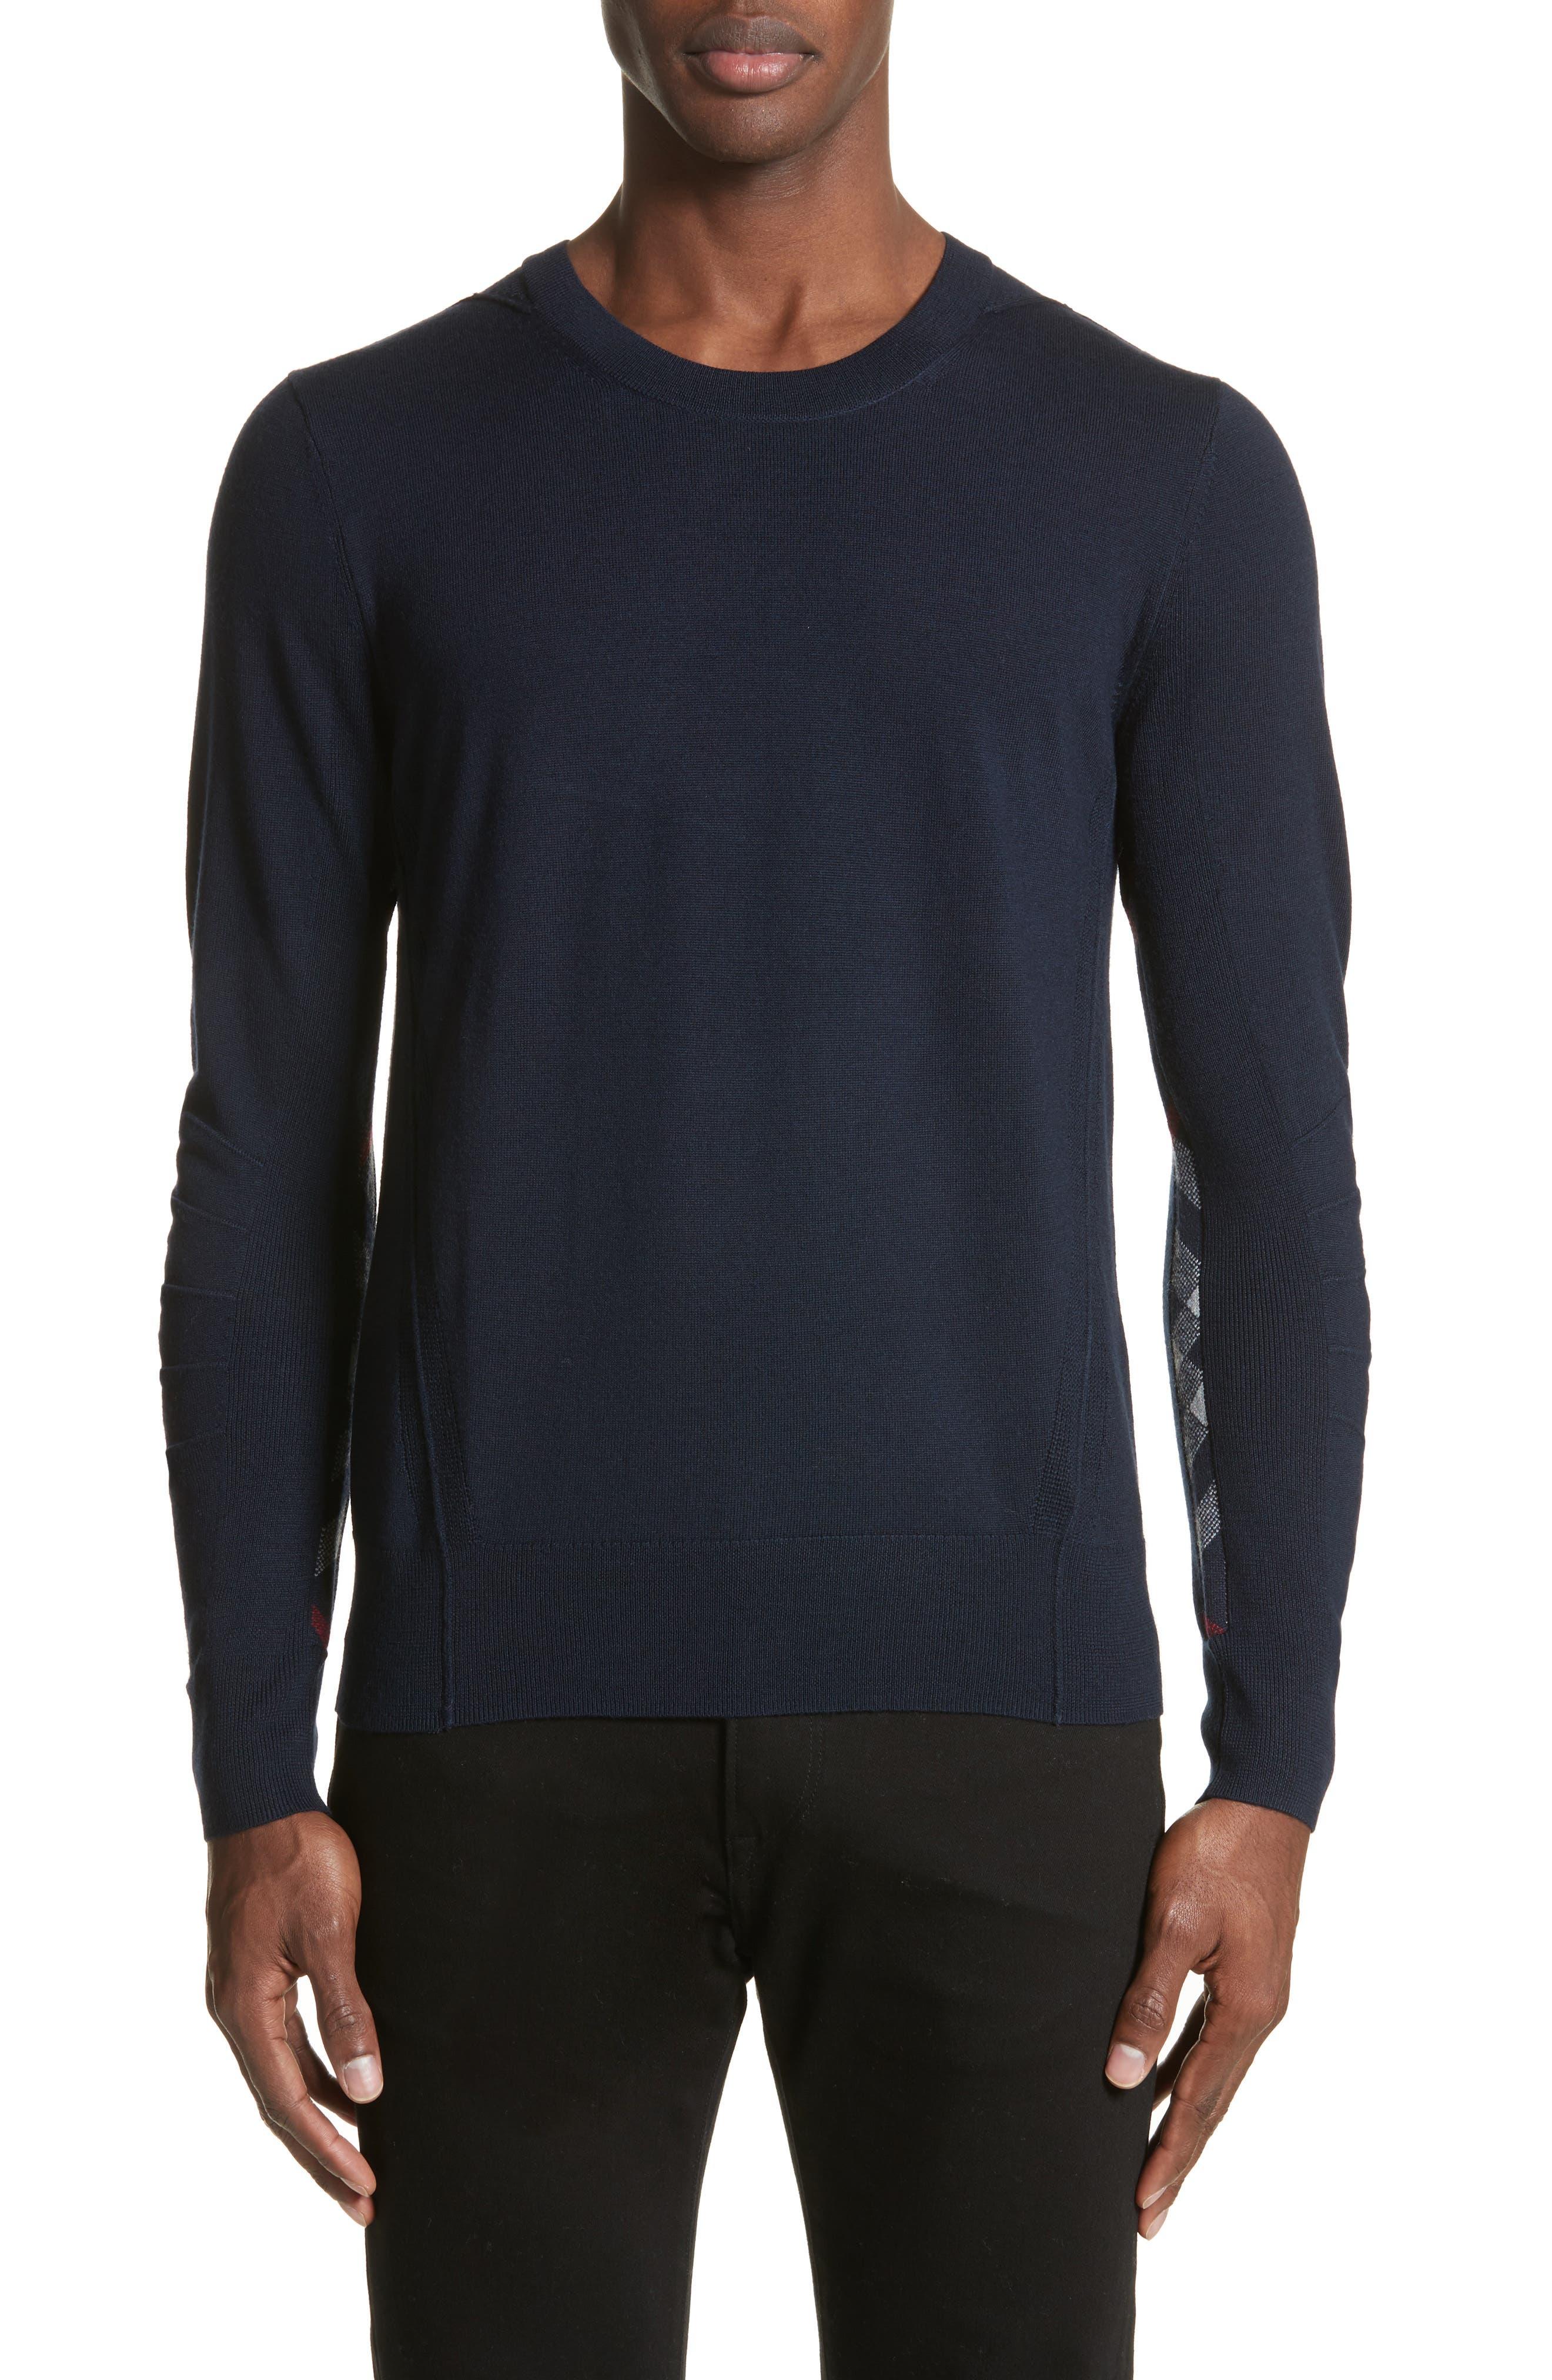 Carter Merino Wool Crewneck Sweater,                             Main thumbnail 3, color,